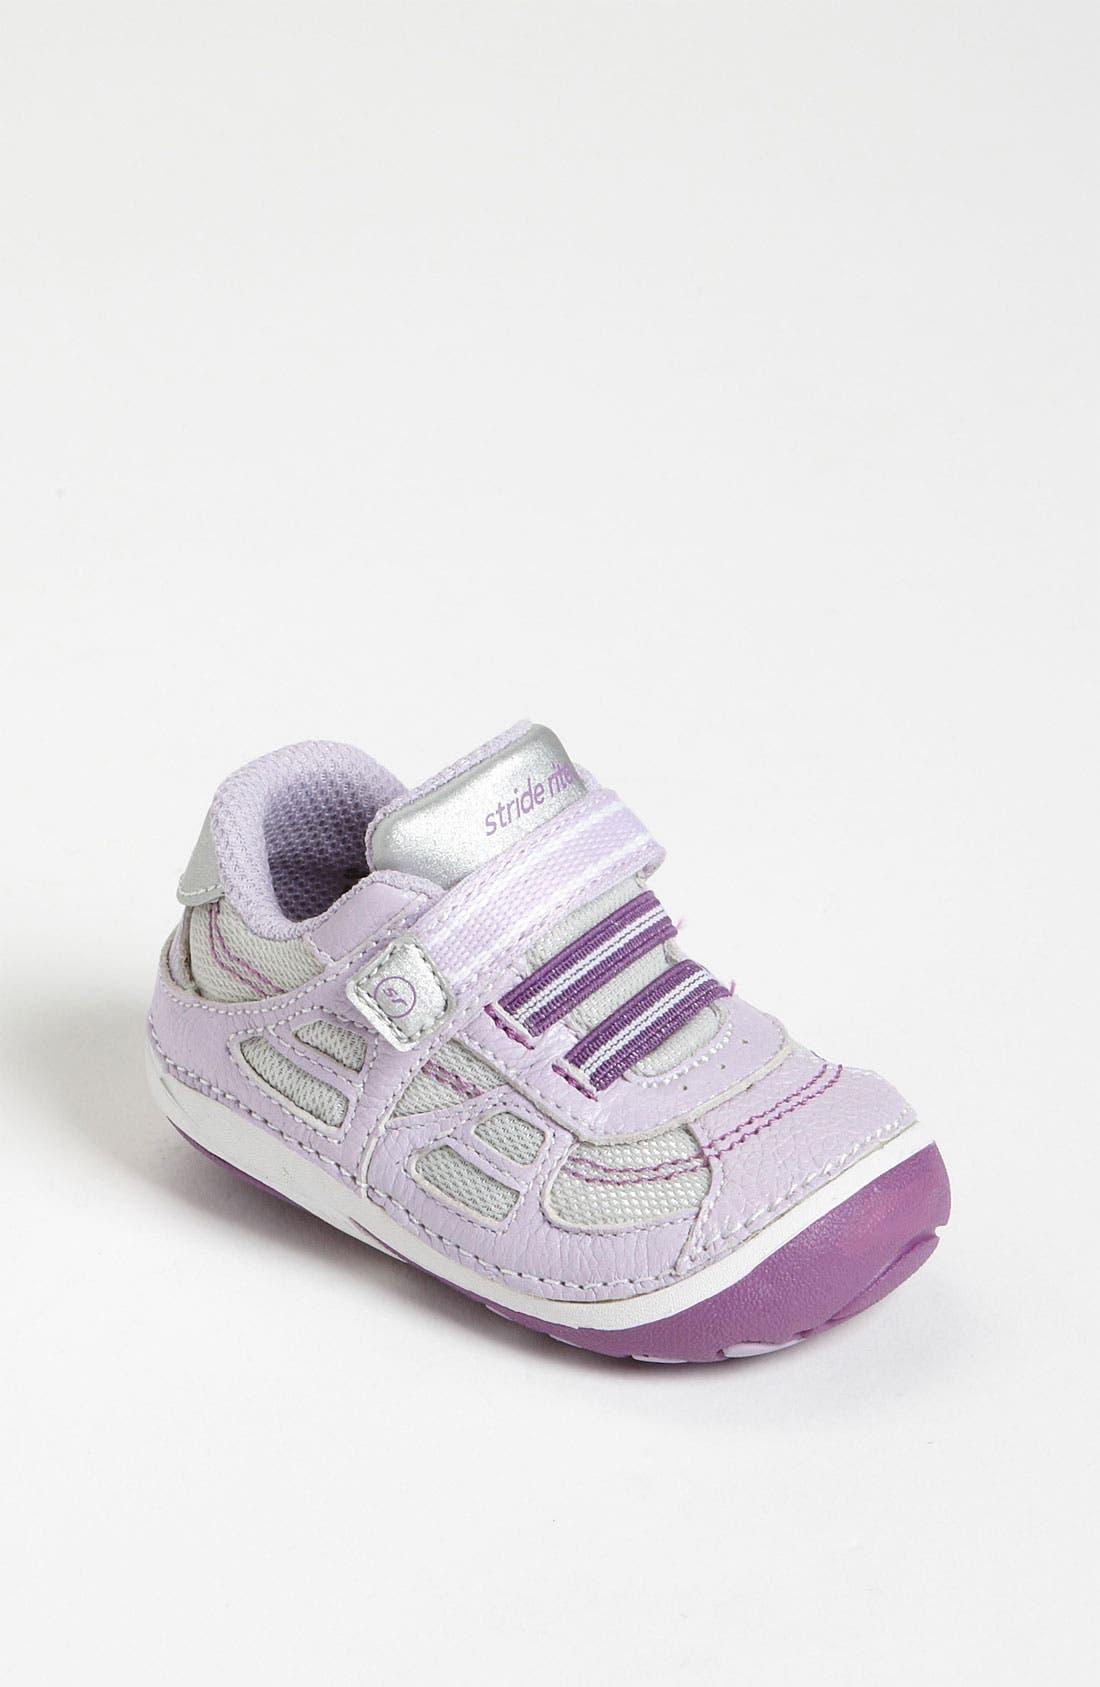 Main Image - Stride Rite 'Tinka' Sneaker (Baby & Walker)